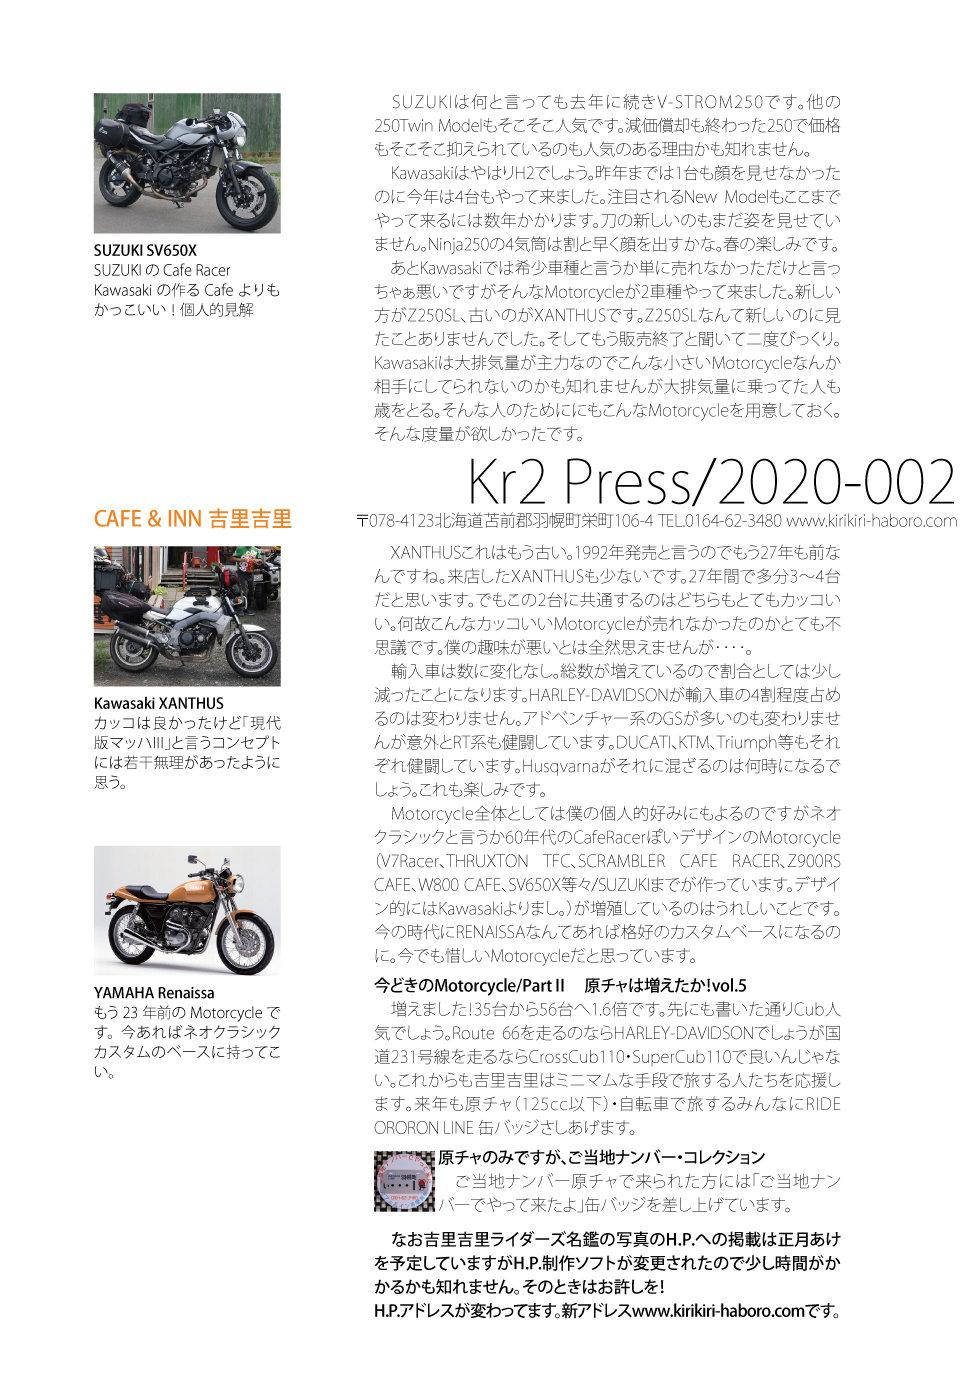 2020Kr2Press02.jpg